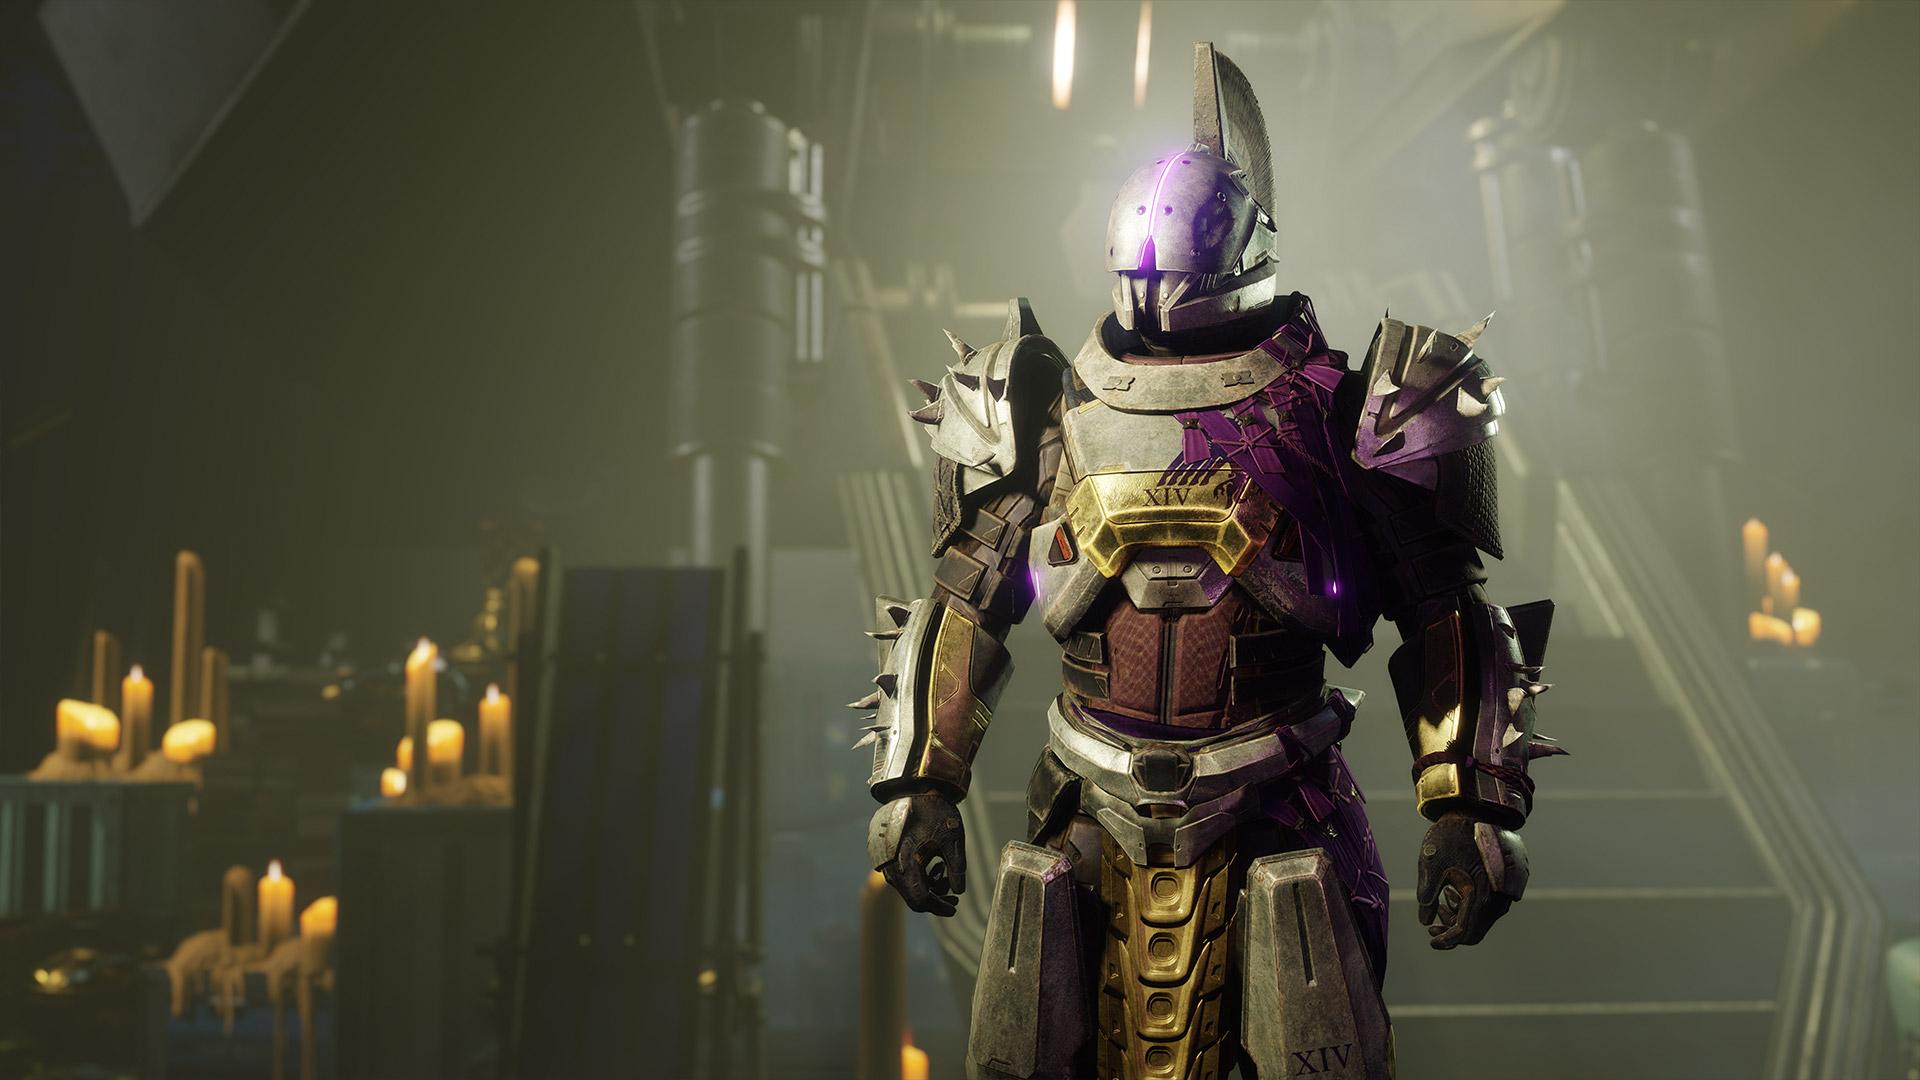 Destiny 2: Shadowkeep - Season of Dawn roadmap, Lantern of